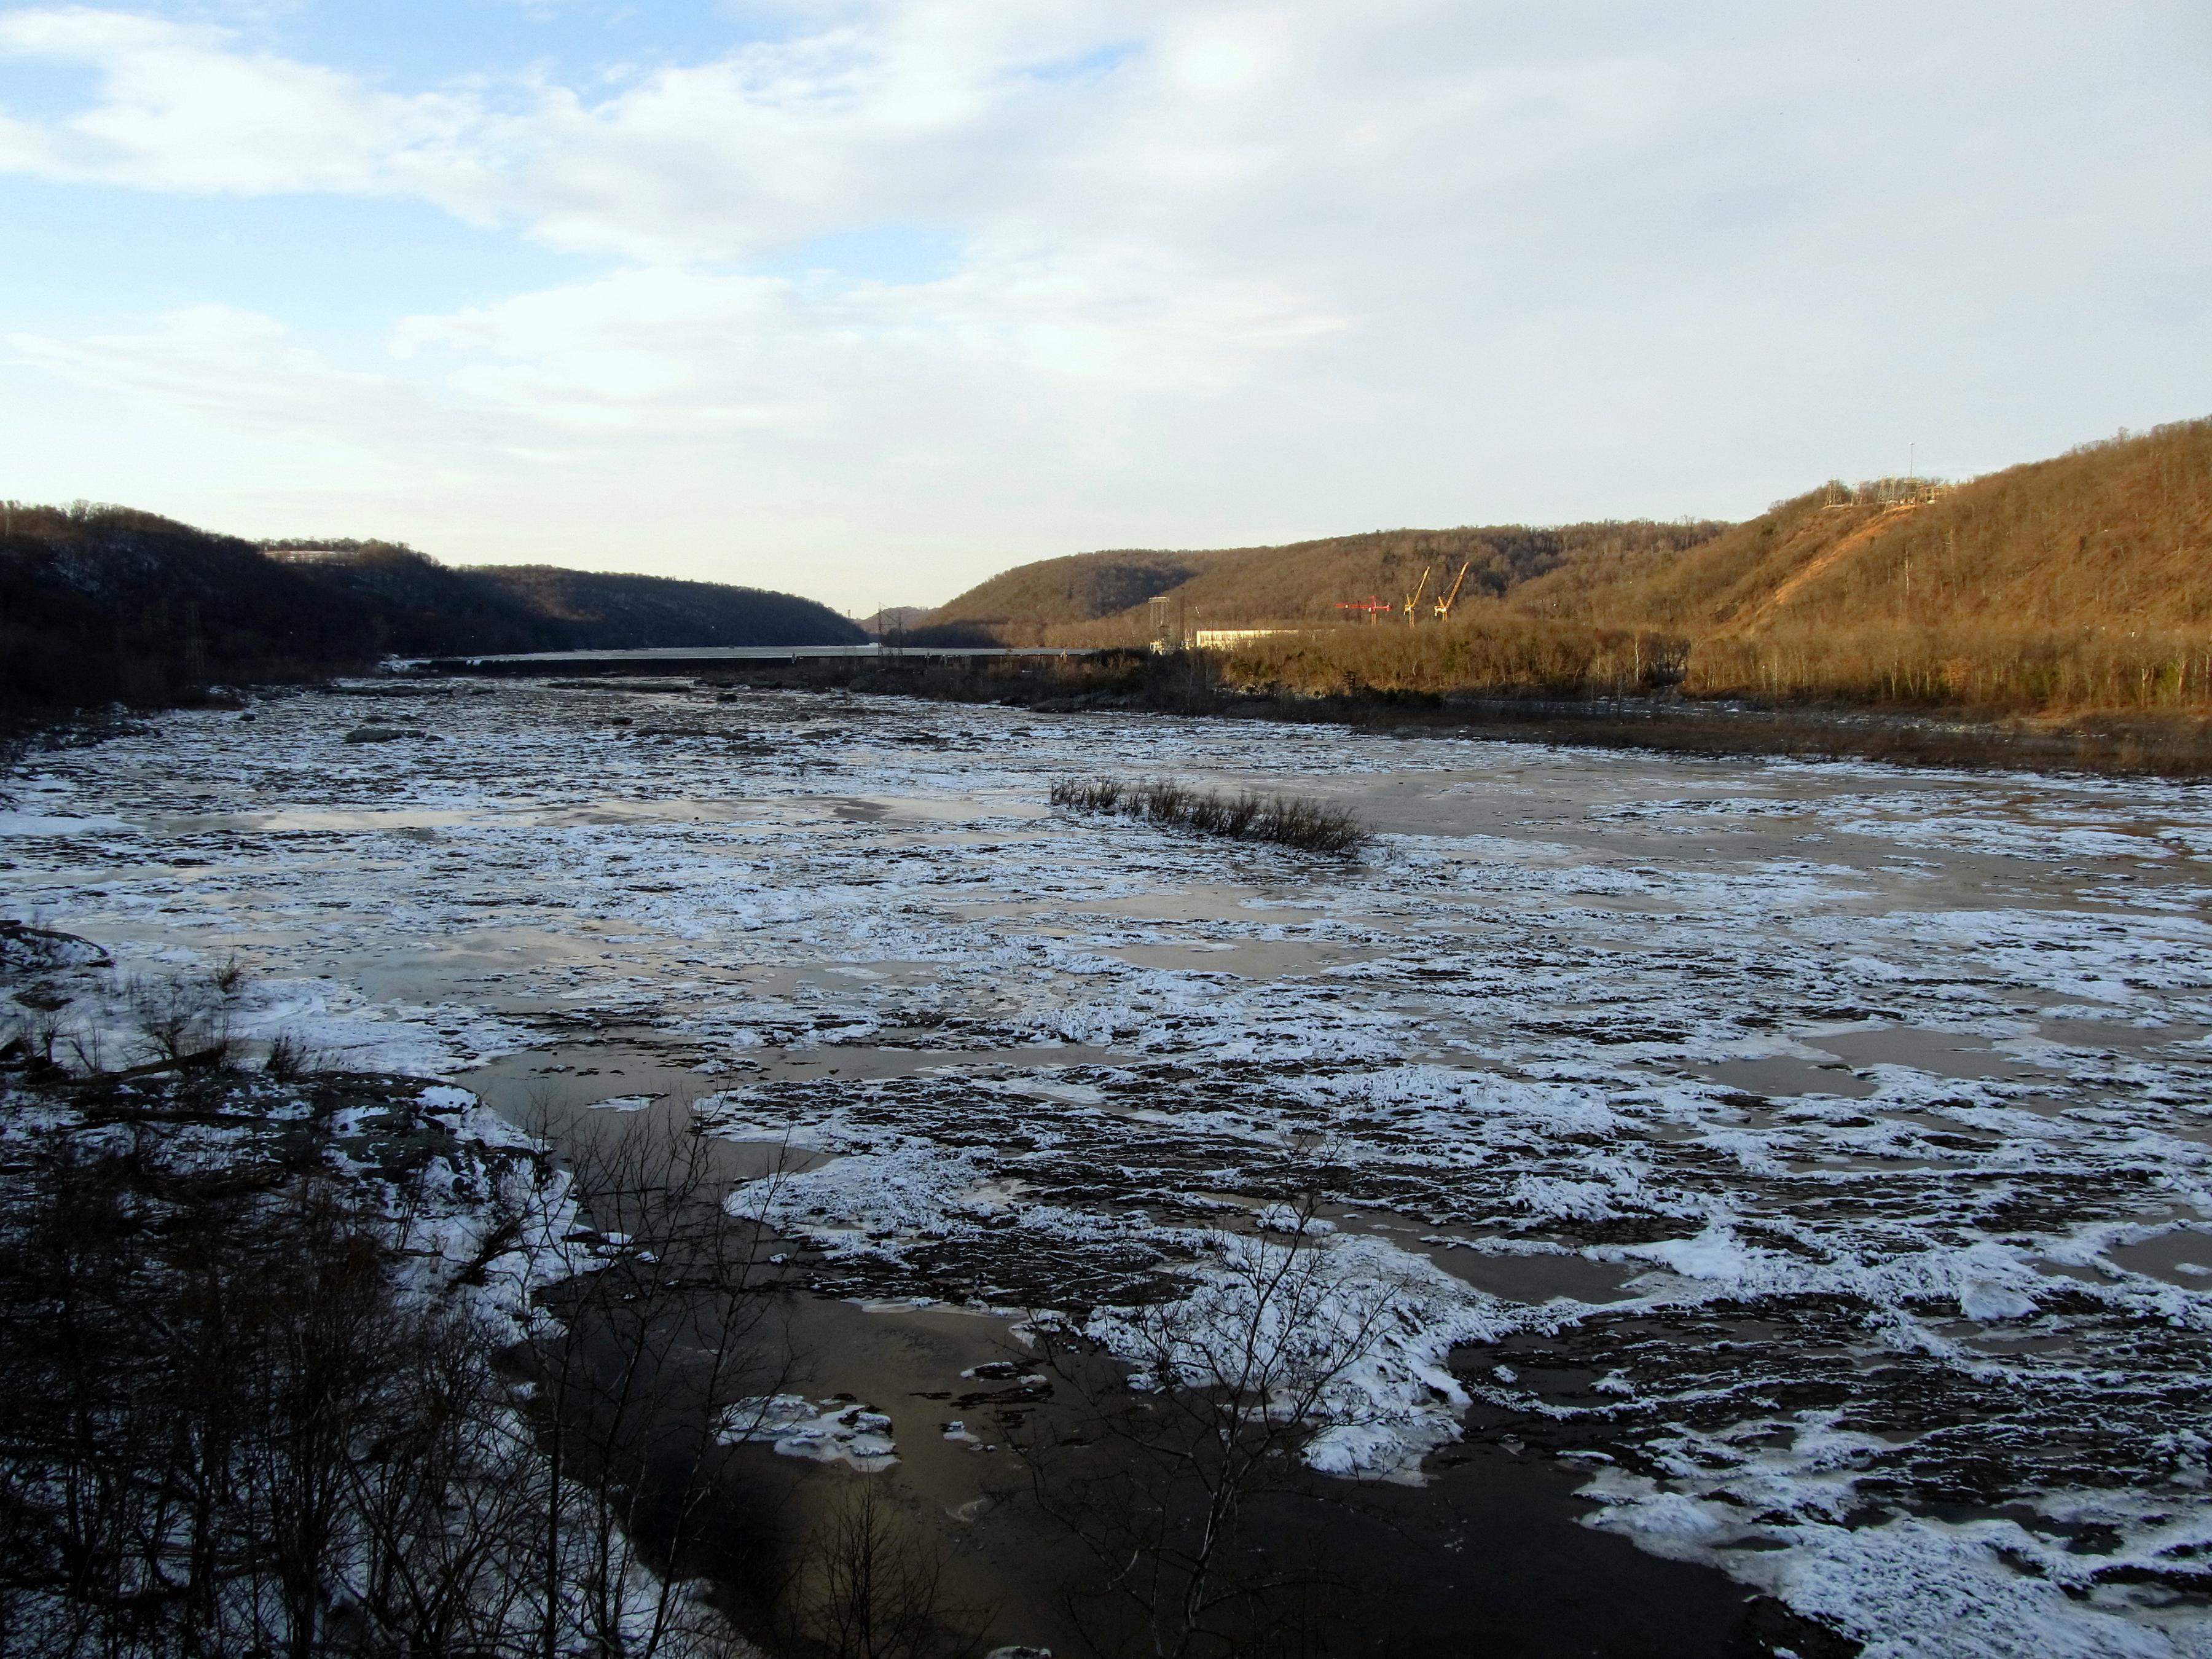 Autumn susquehanna river photo